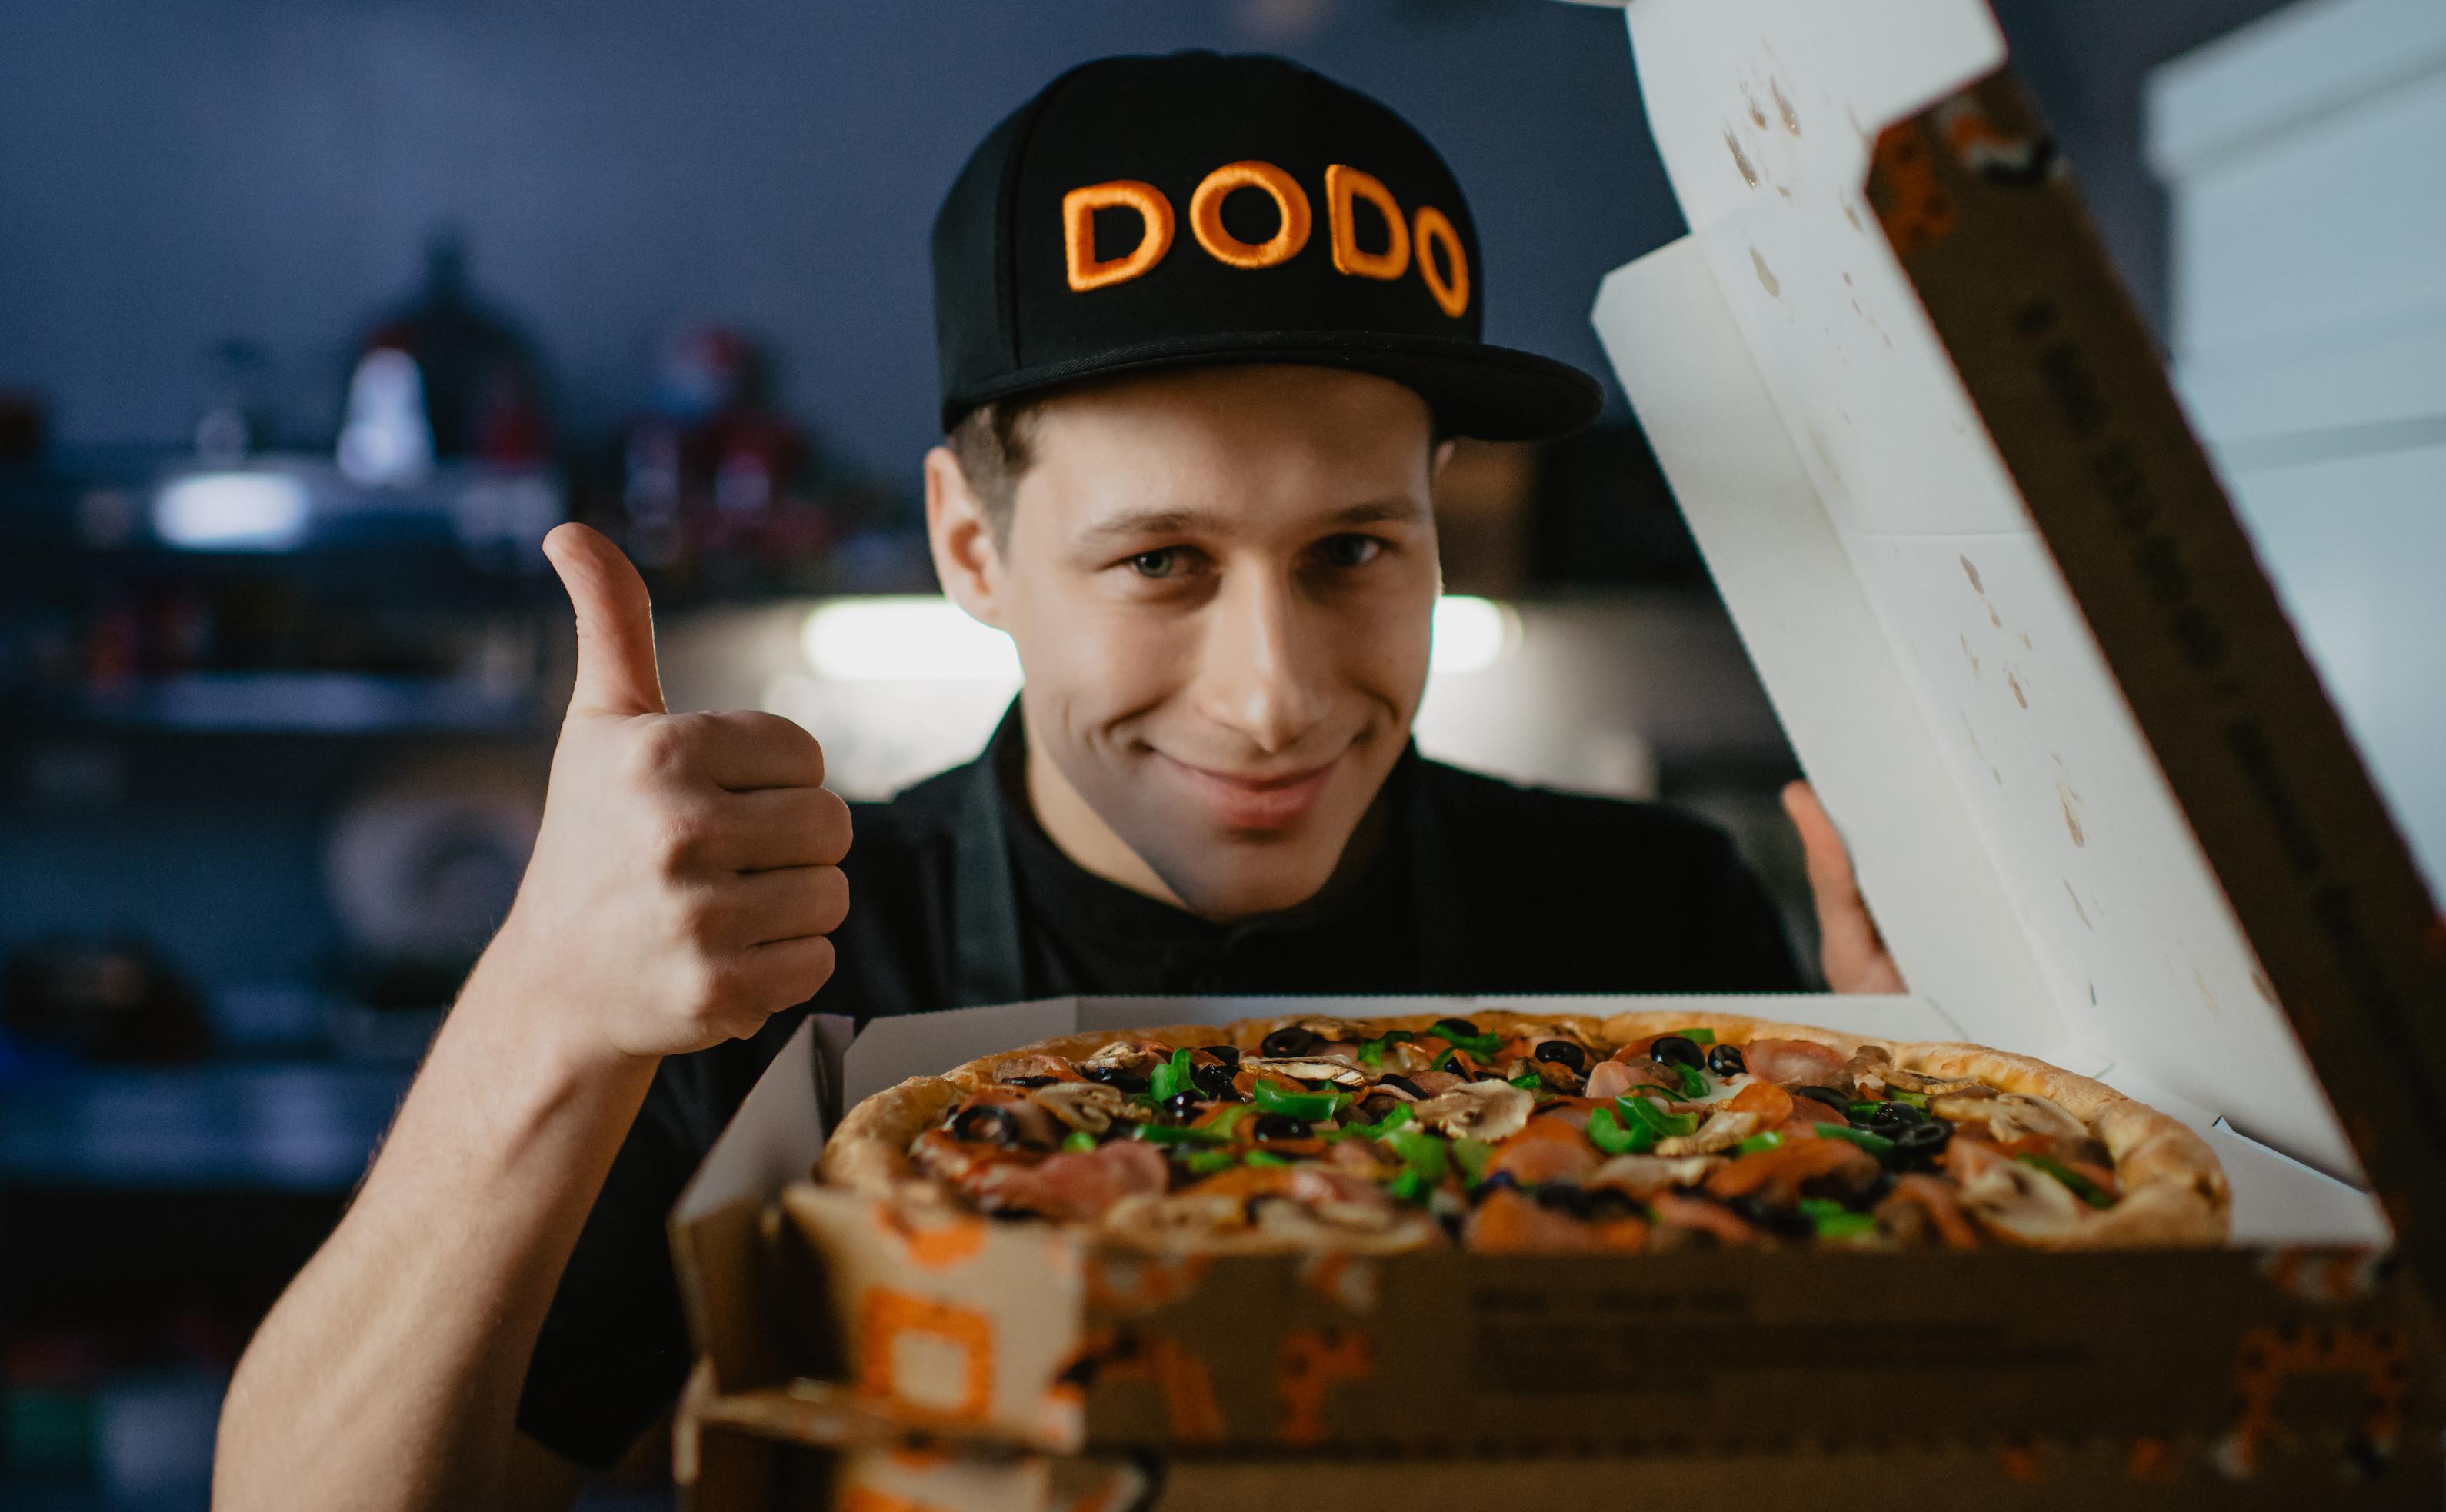 https://d33wubrfki0l68.cloudfront.net/b29a4bbc4f344fcaeb25edbe22f2eb59d16eda67/94aaf/img/good-pizza-means-goog-sales.jpg